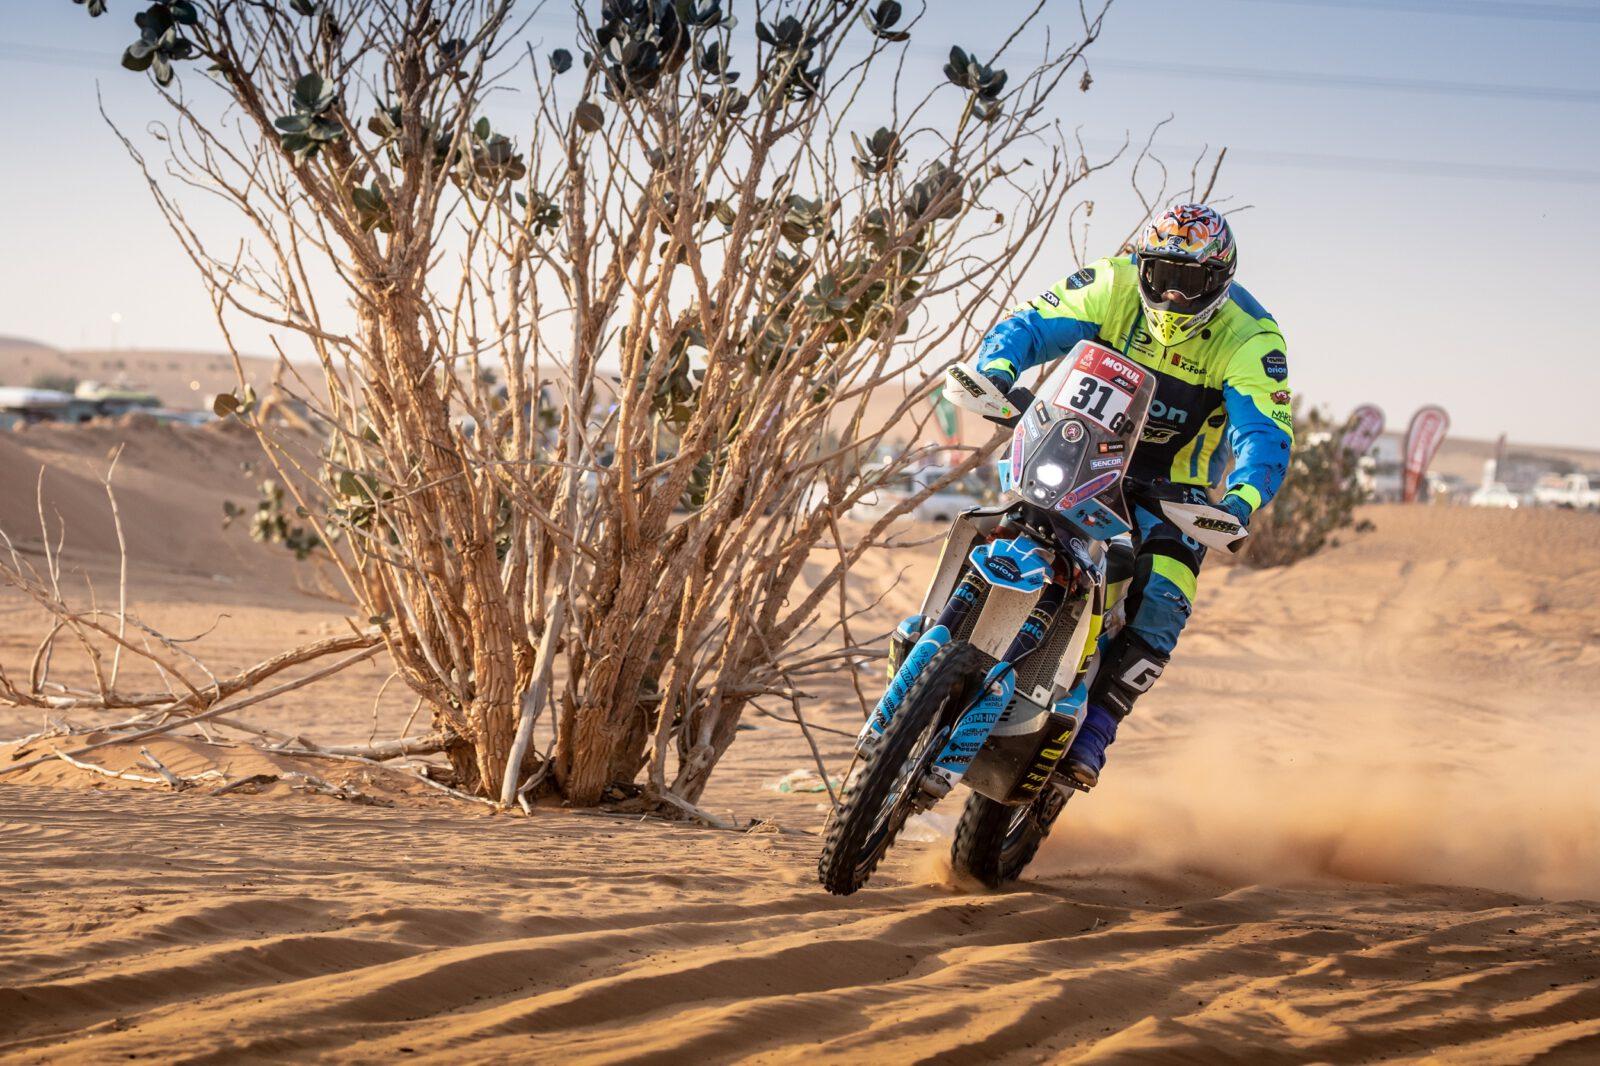 Dakar et rally-raid - Page 12 31-Martin-Michek-CZE-KTM-ORION-%E2%80%93-Moto-Racing-Group-Dakar-2021-etapa-5